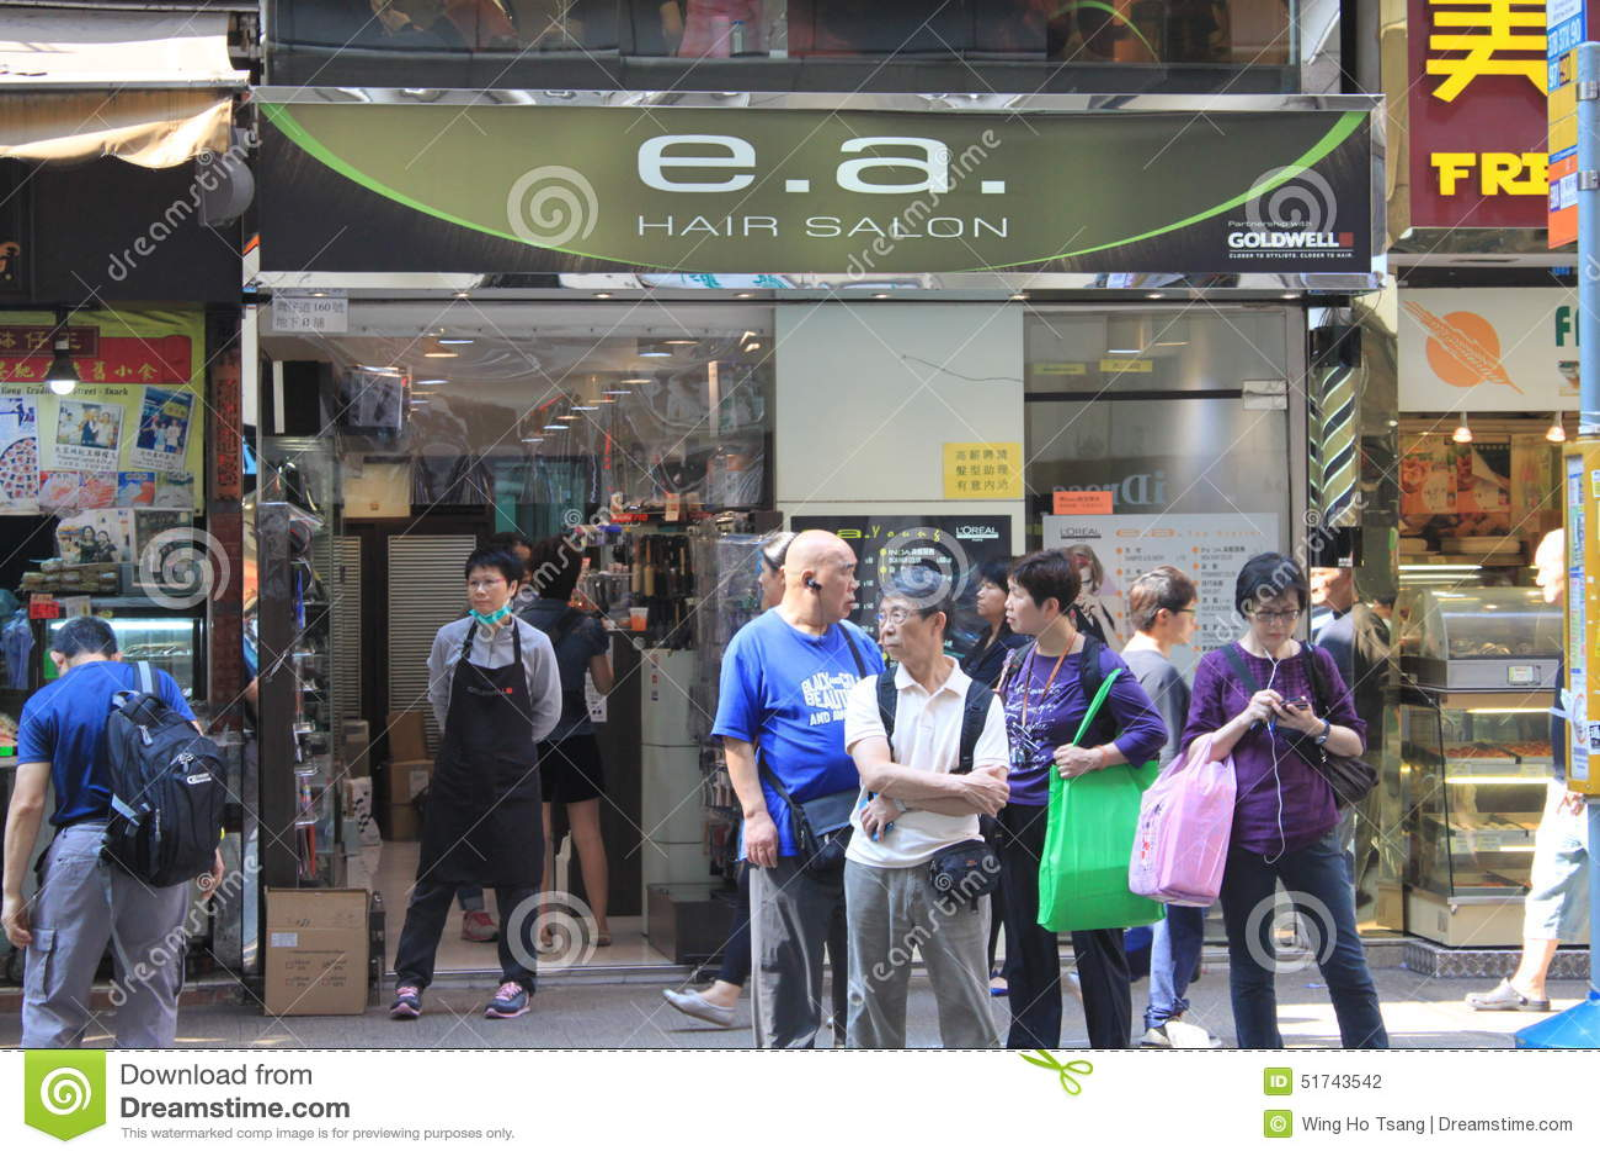 Ea hair salon in hong kong editorial photography image of for Hair salon hk